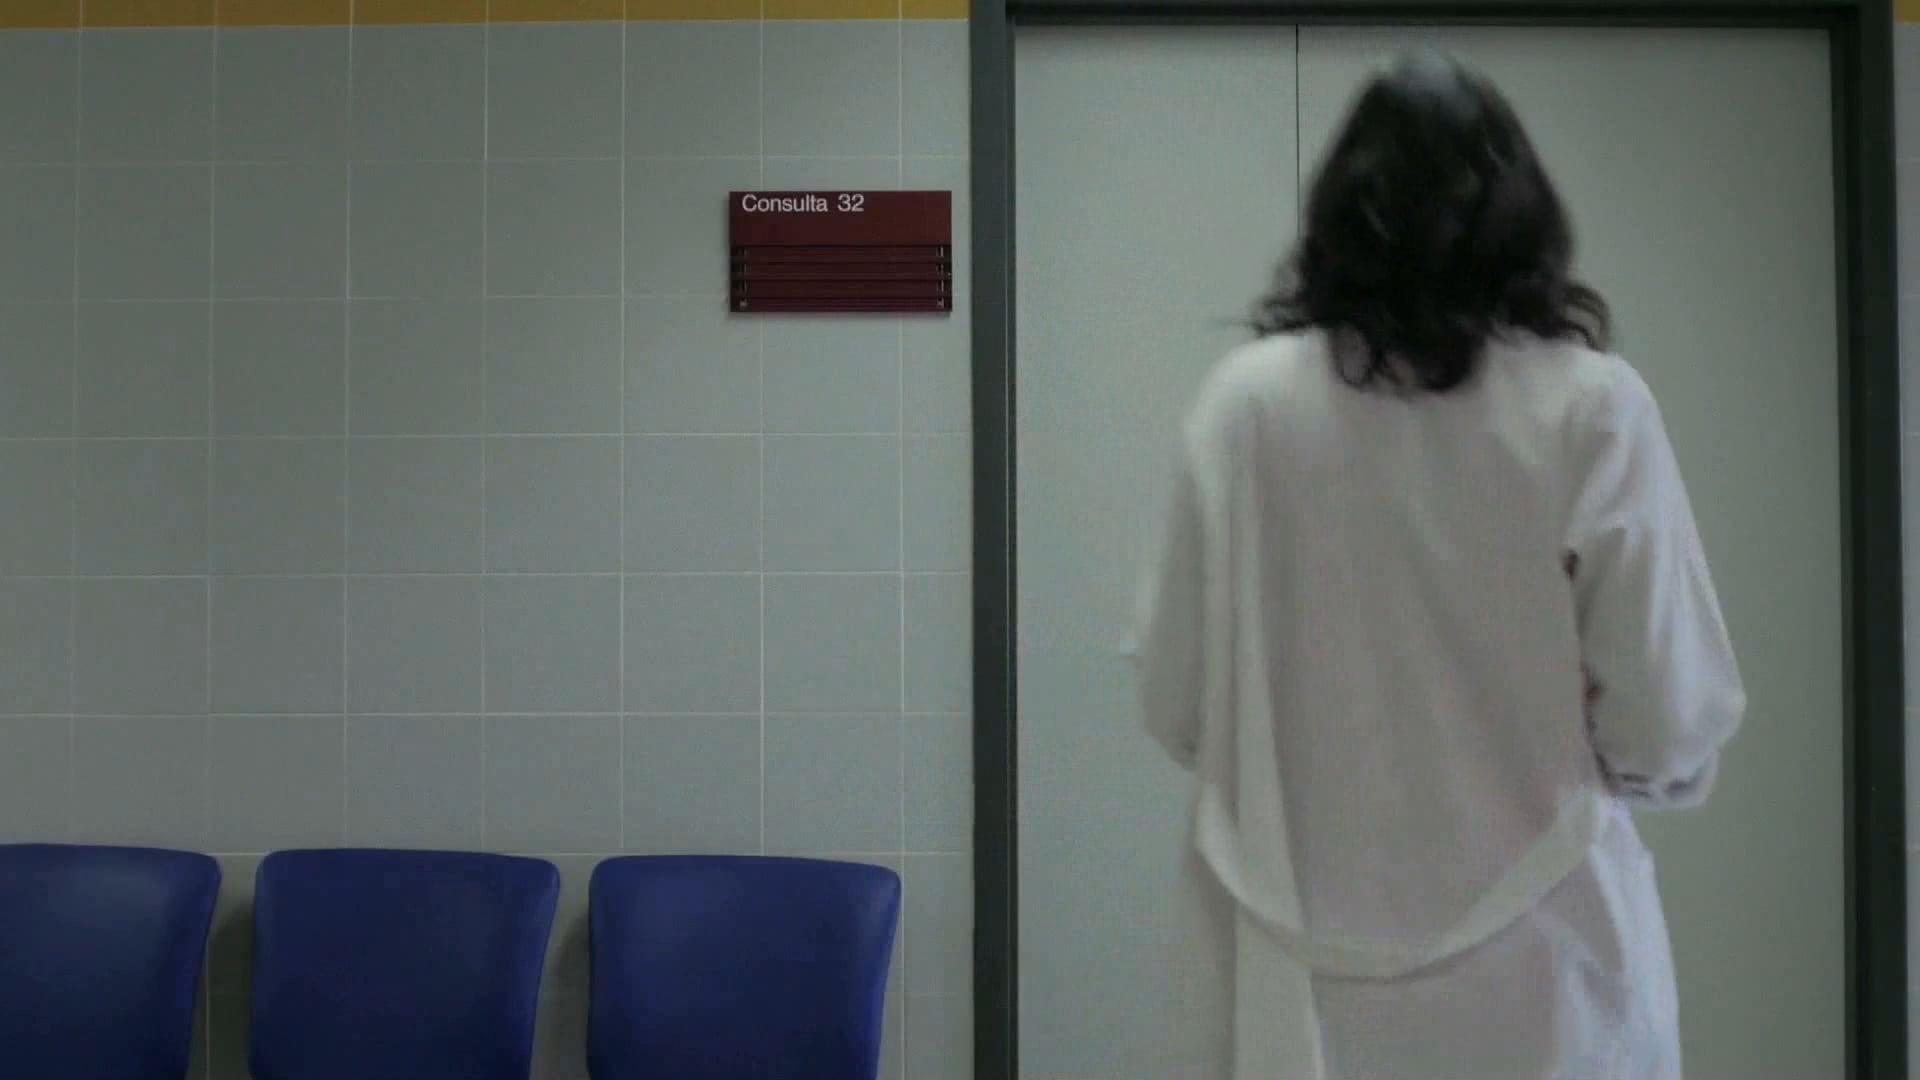 Hospital Room 32 (Teaser)